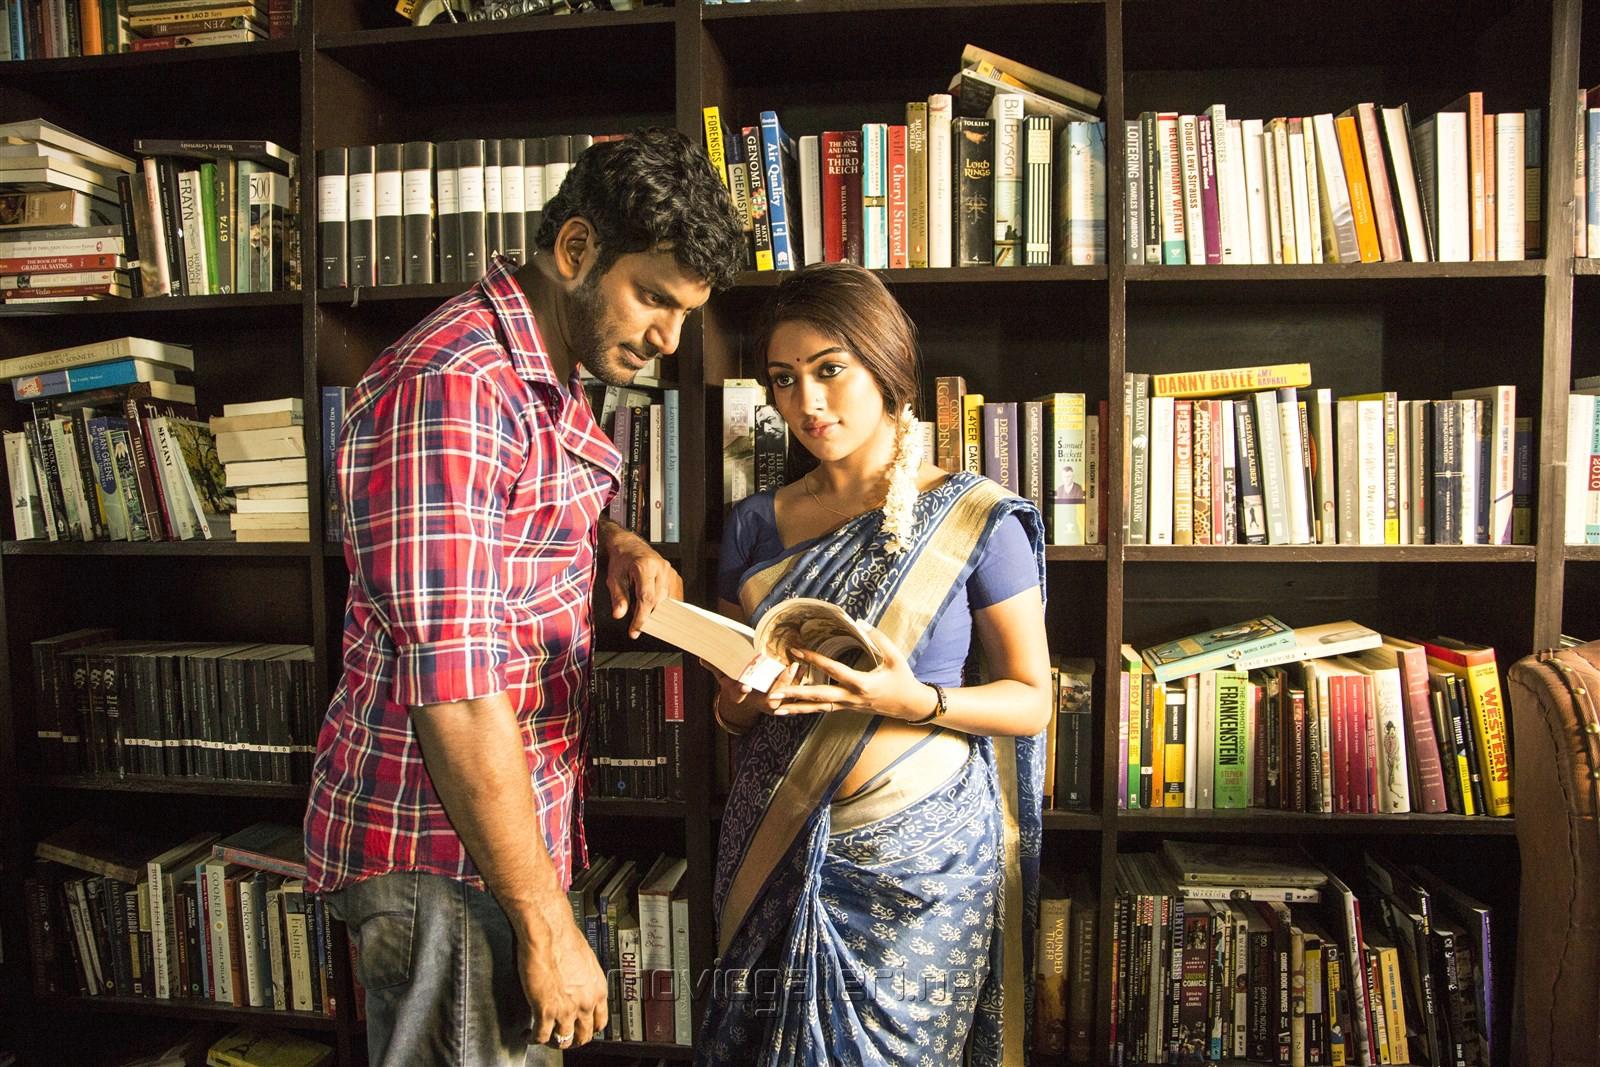 Vishal Anu Emmanuel Detective Telugu Movie Images